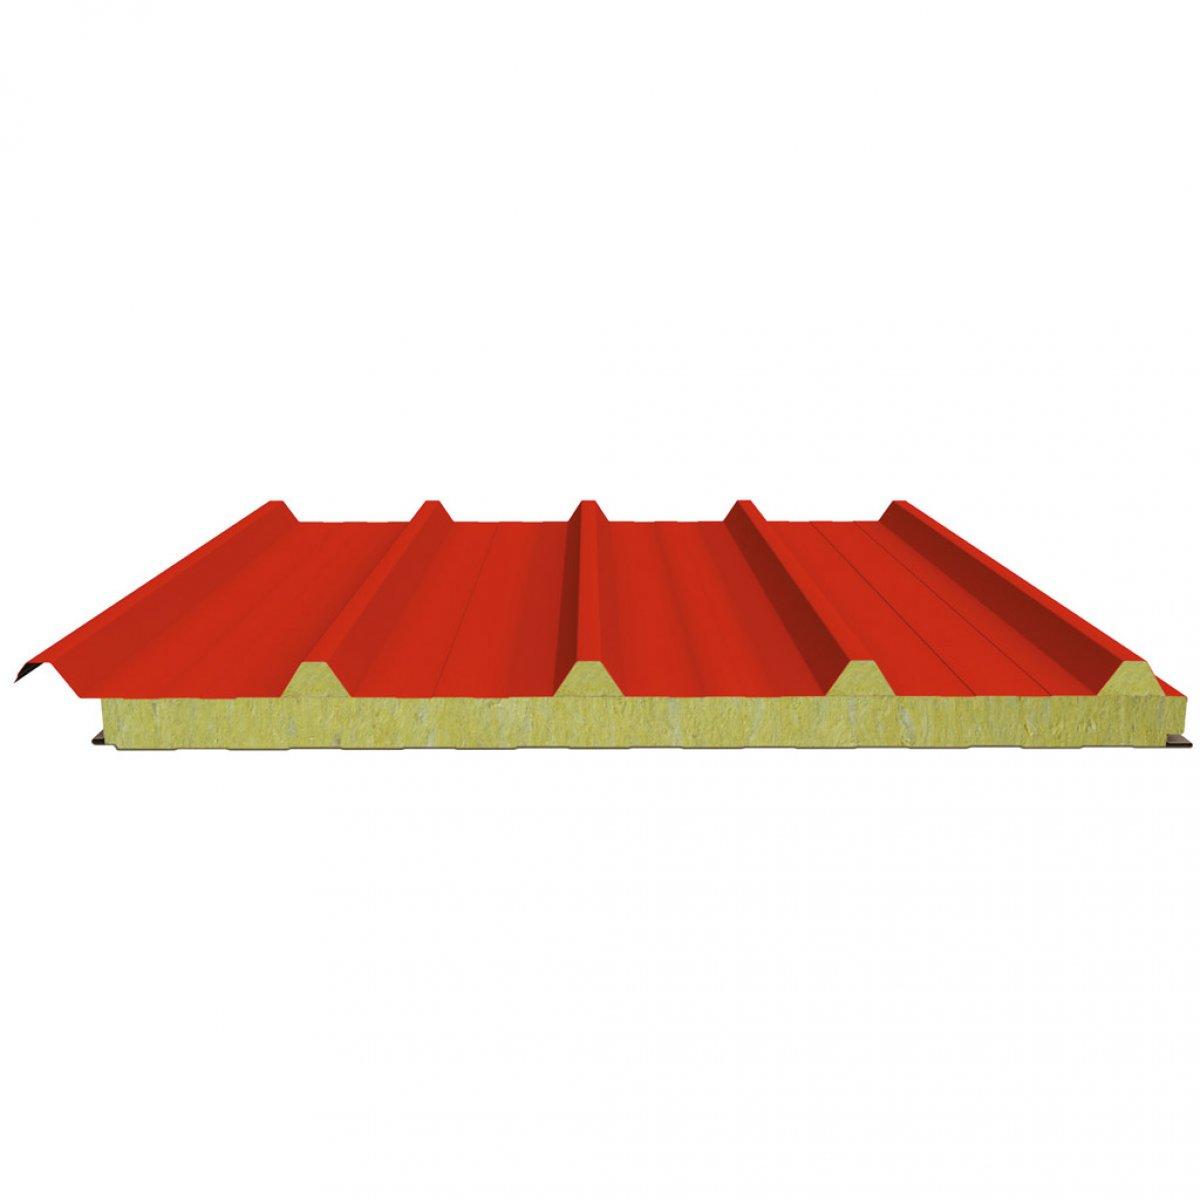 Taşyünü Çift Kilitli Çatı Paneli